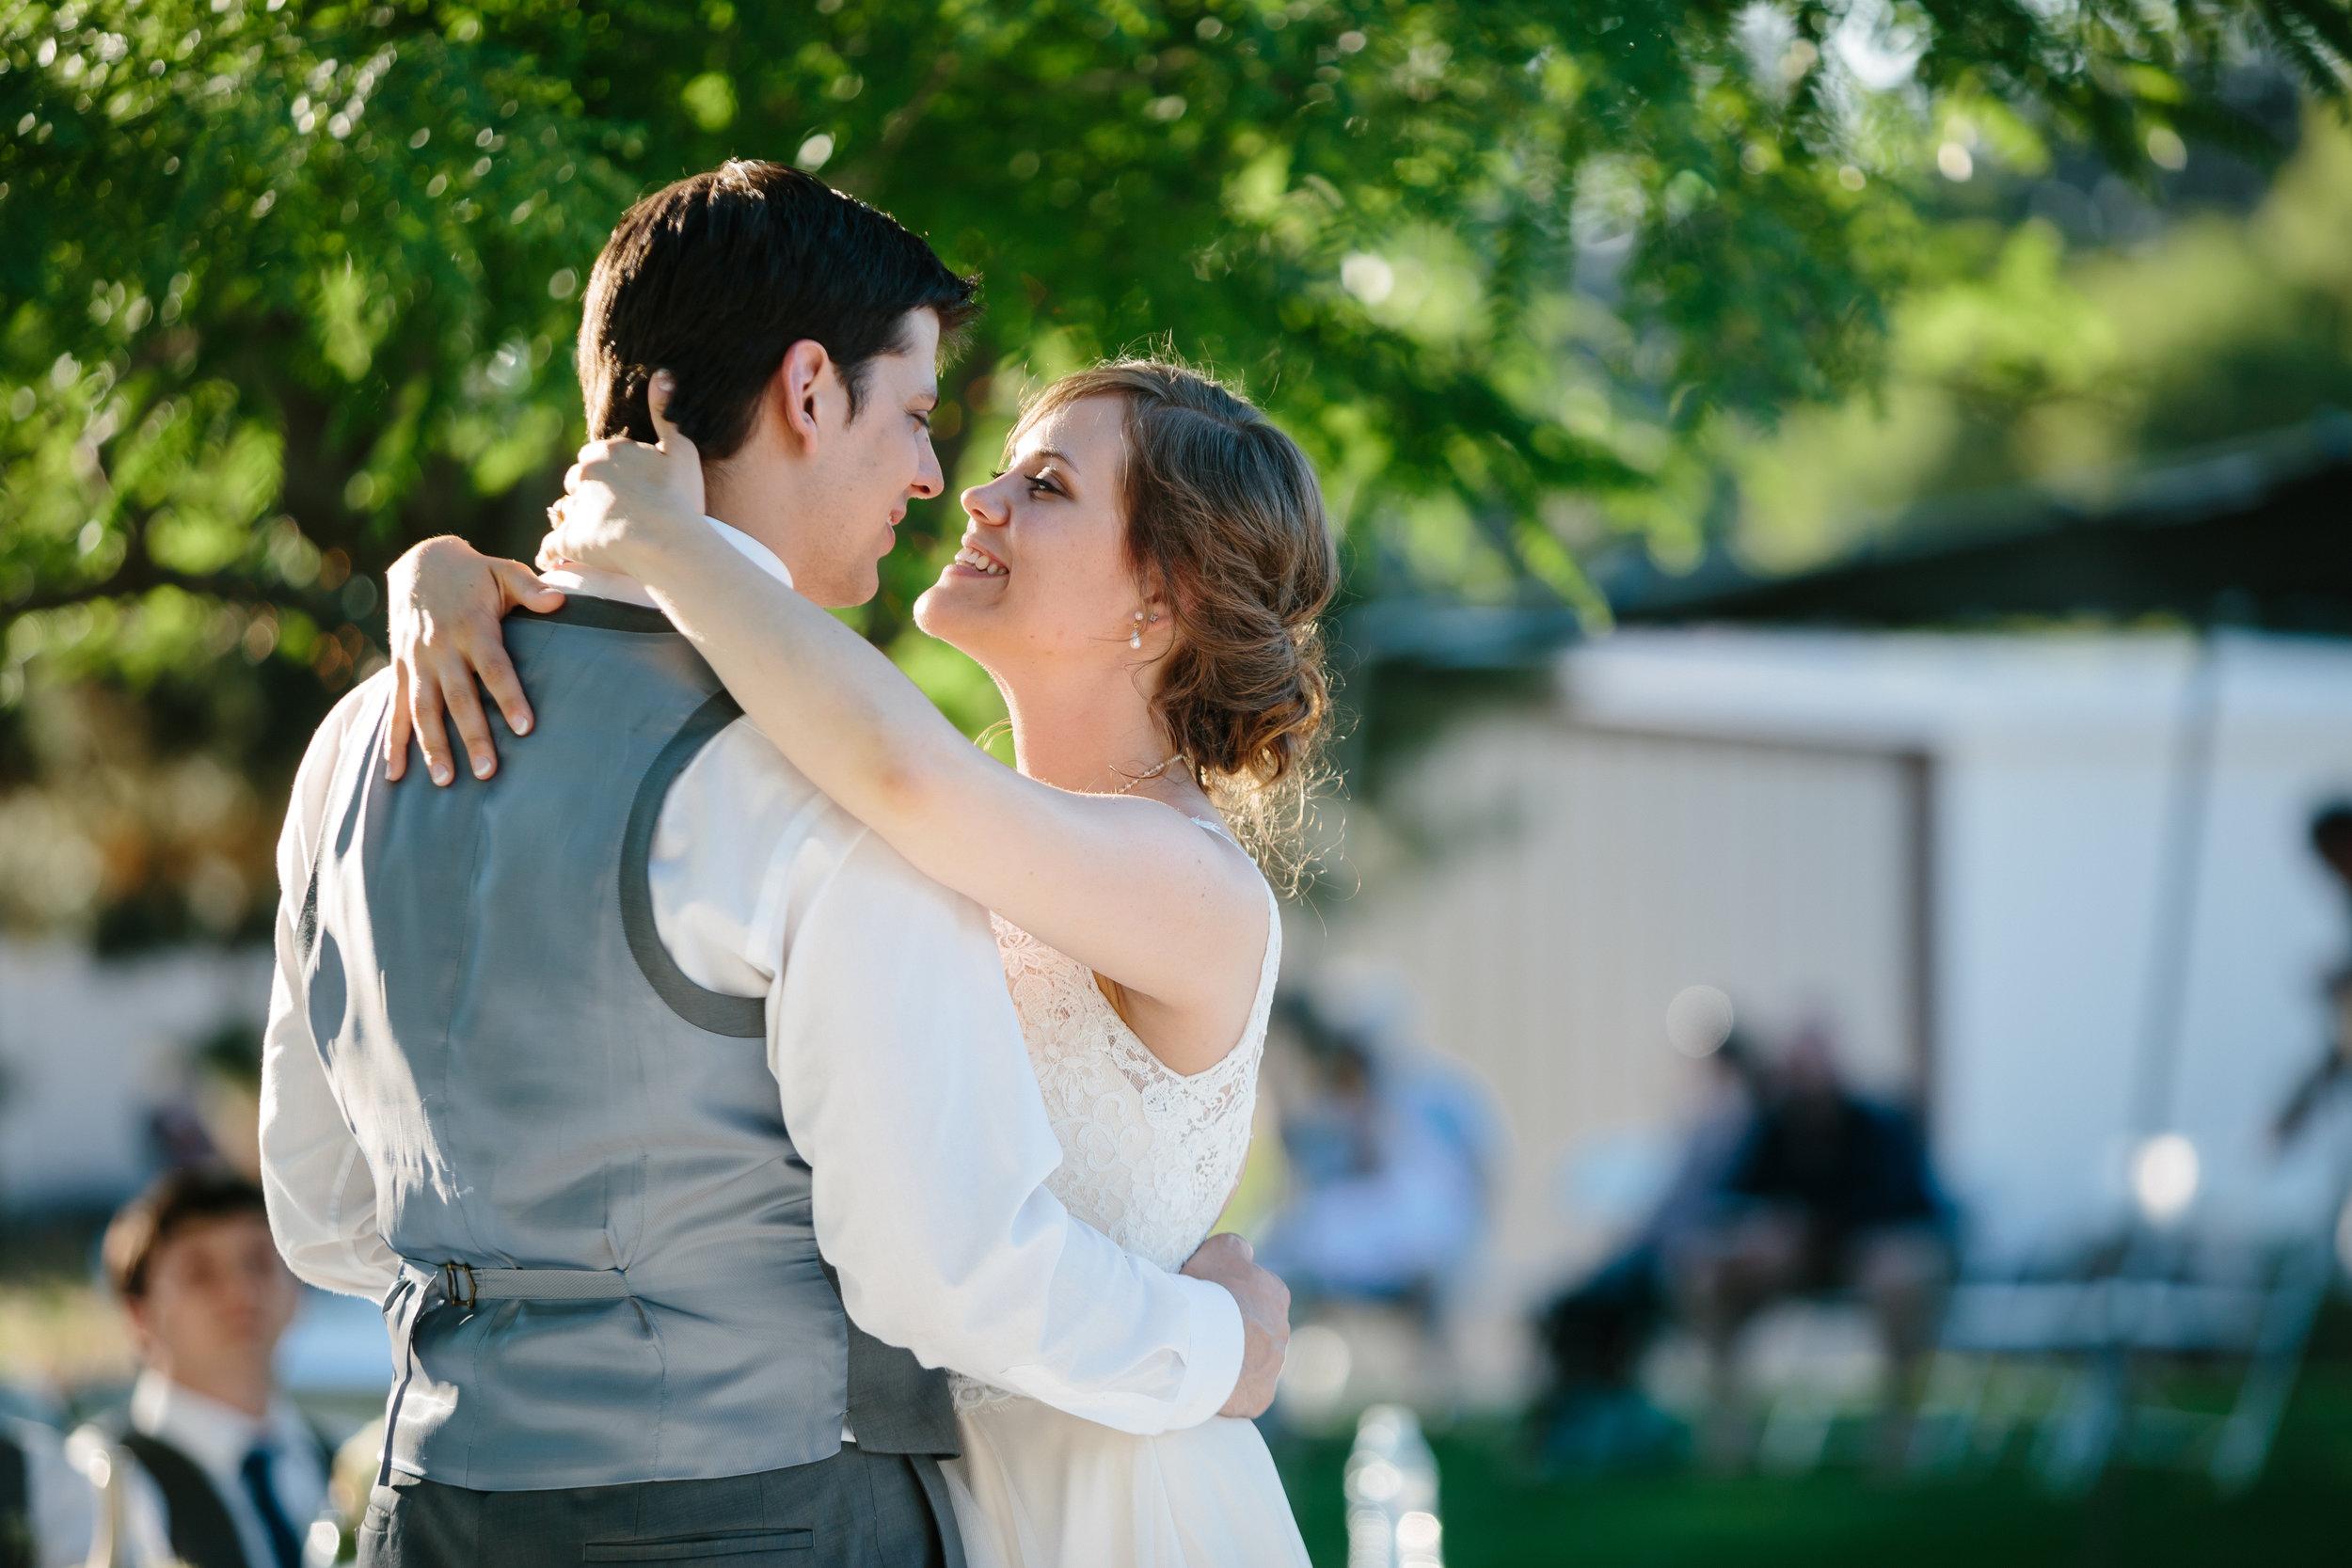 Jordan & Shantel Married - Idaho - Corrie Mick Photography-297.jpg